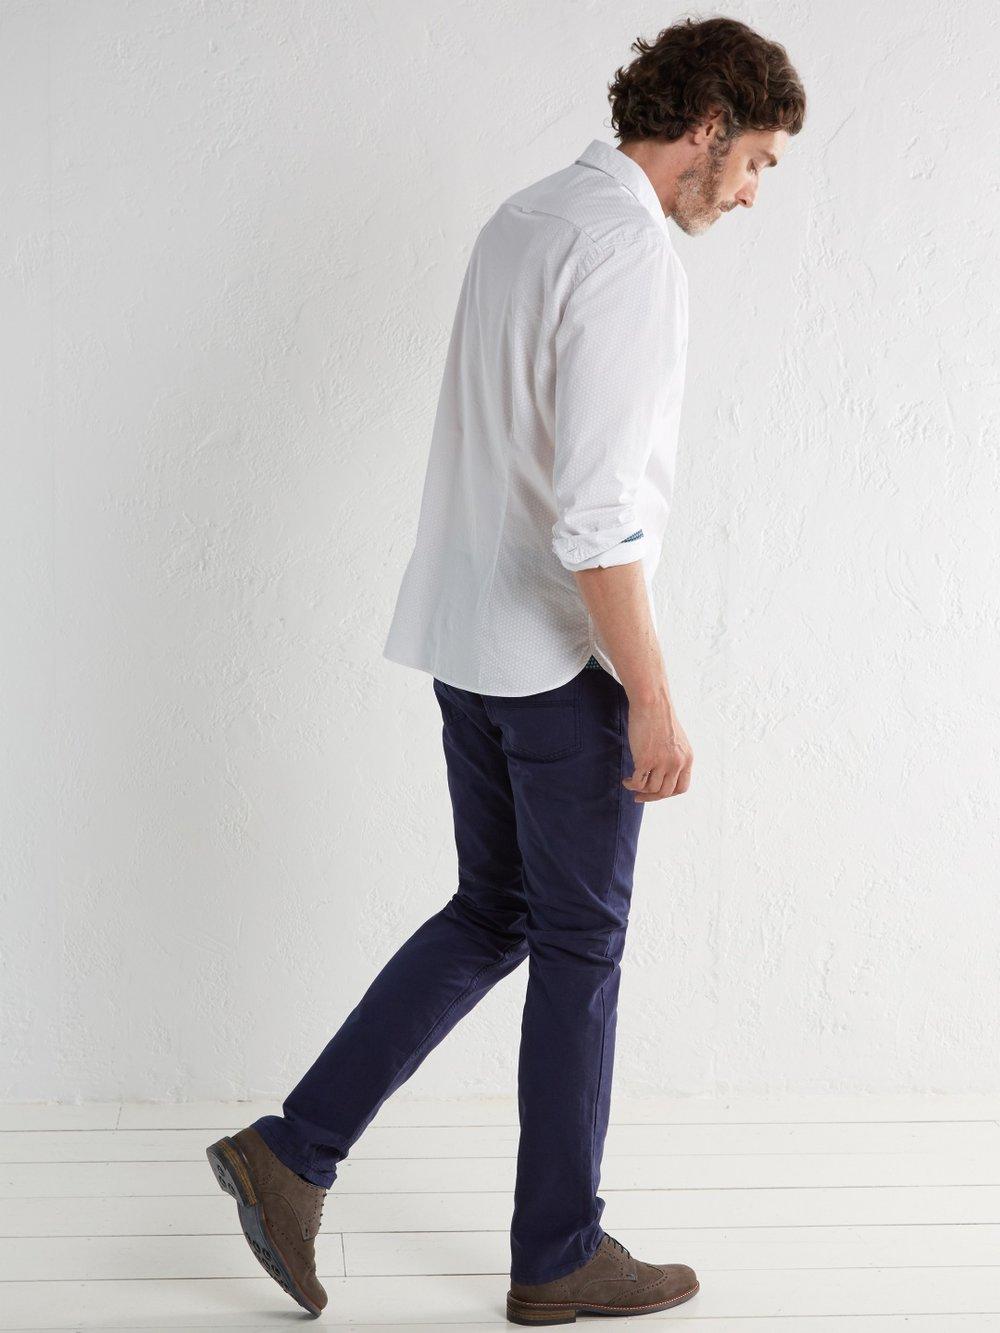 White Stuff: Panama Jean £47.50